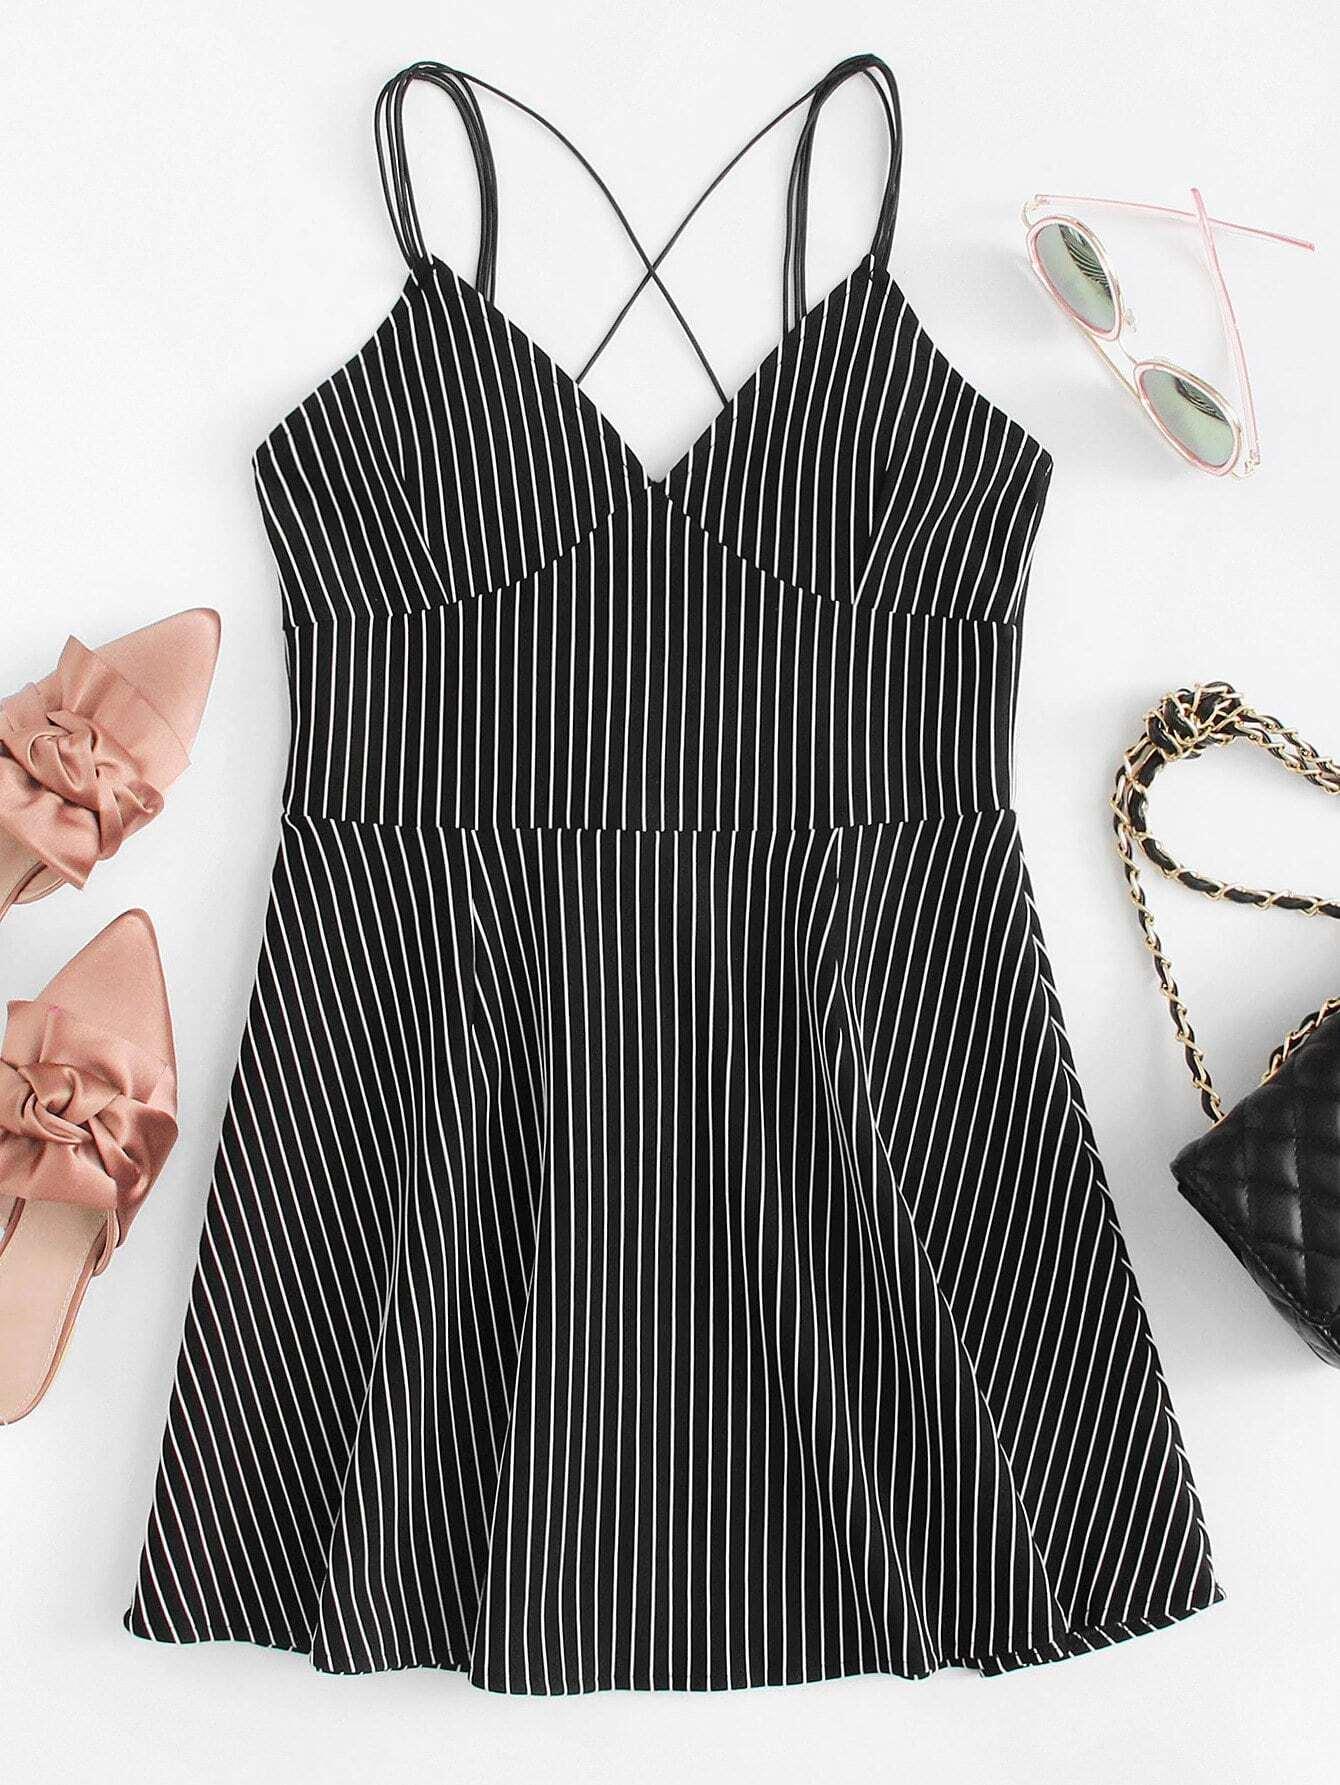 Criss Cross Back Striped Cami Dress rdre180406154